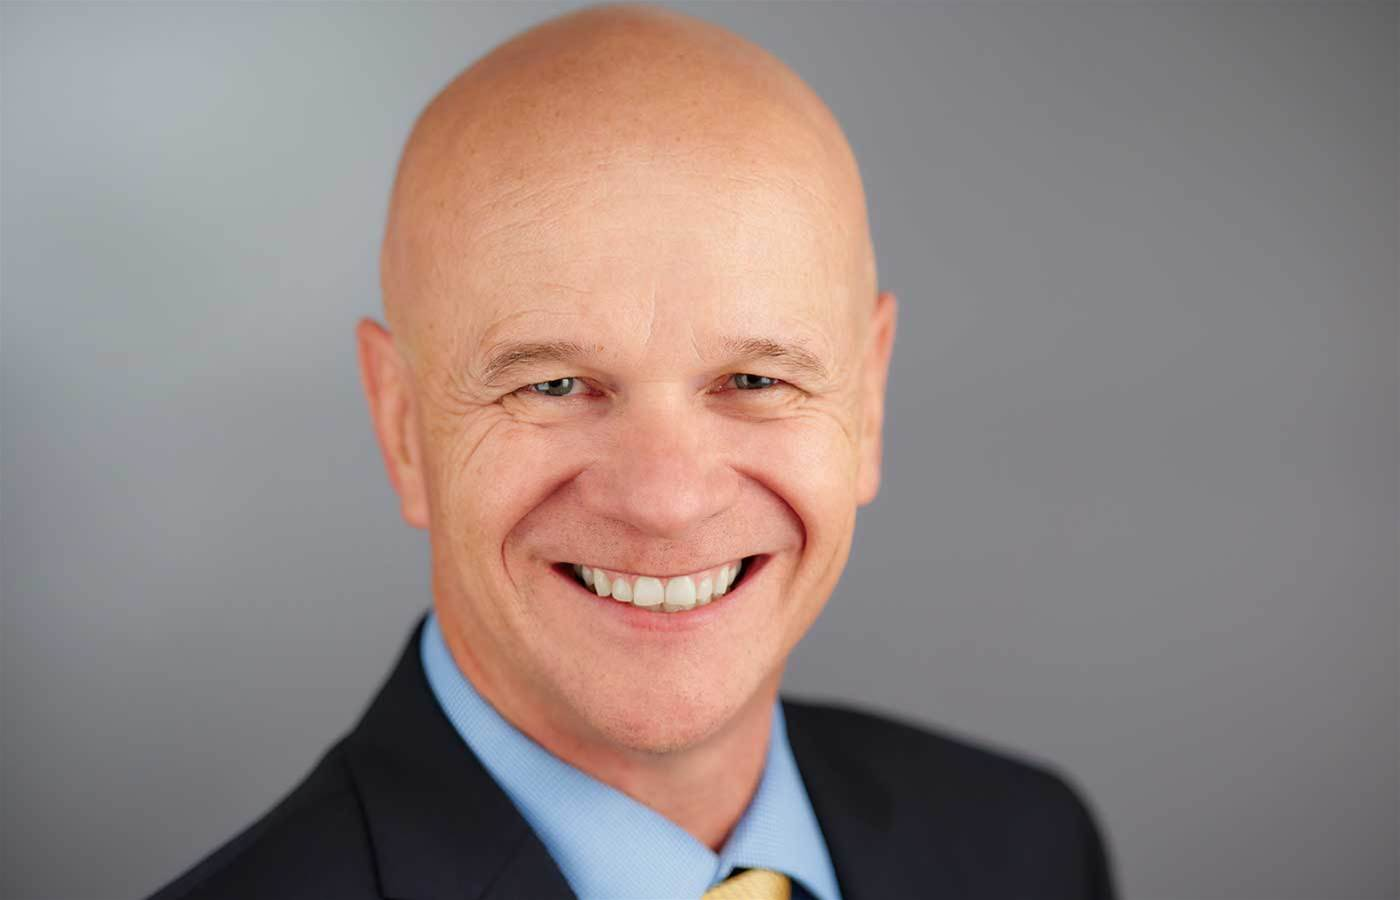 Ricoh appoints Fuji Xerox veteran Simon Lane as production print country manager